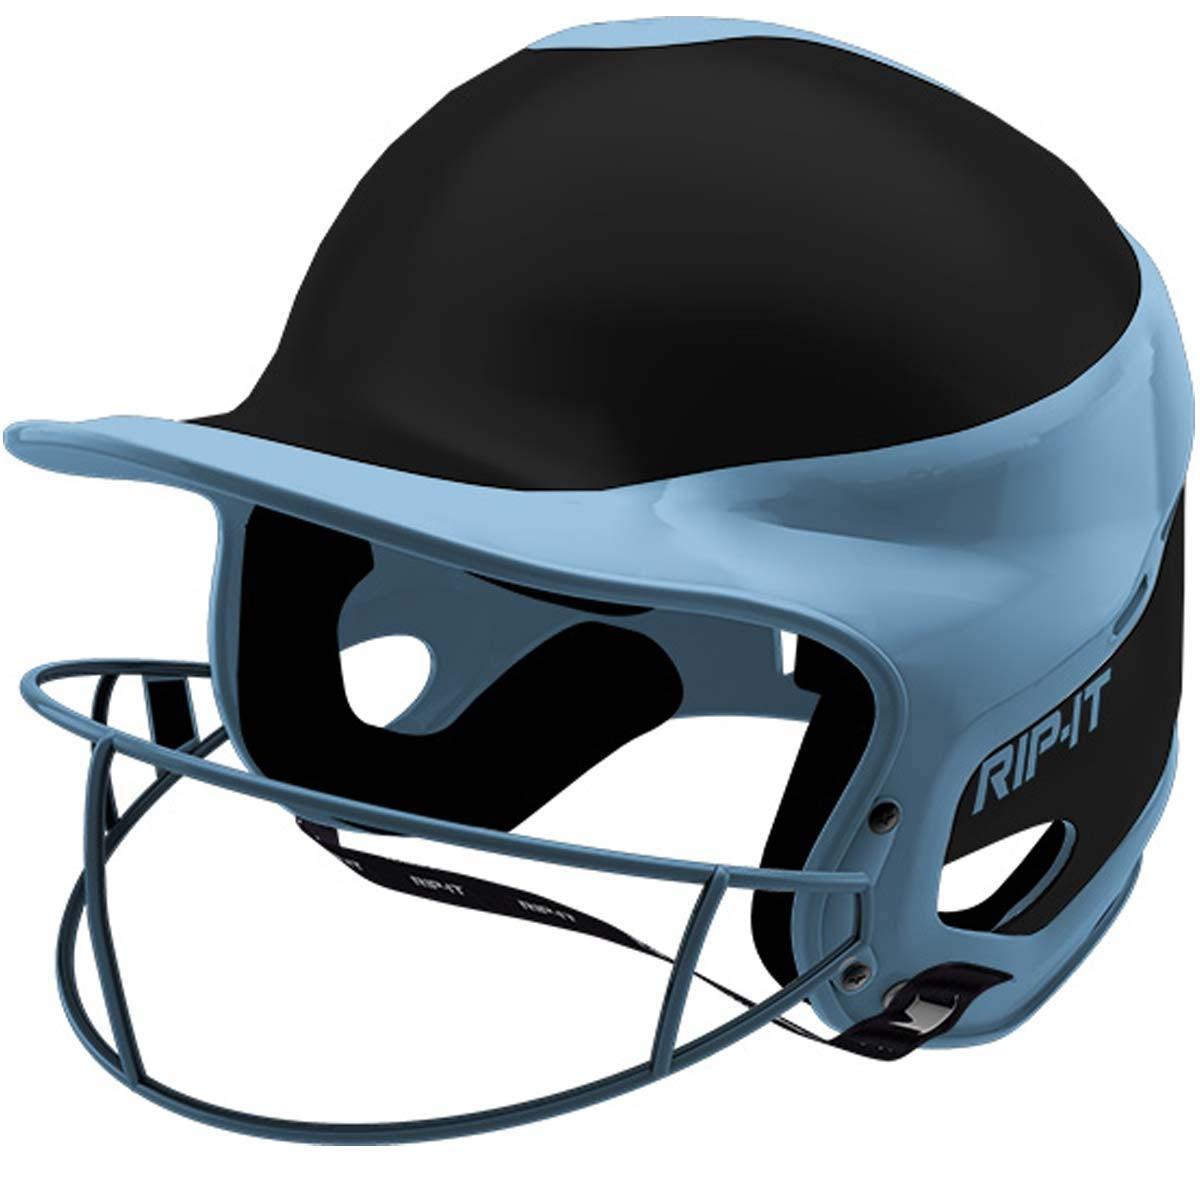 Rip-It Fastpitch Batting Helmet, AWAY Extra Small